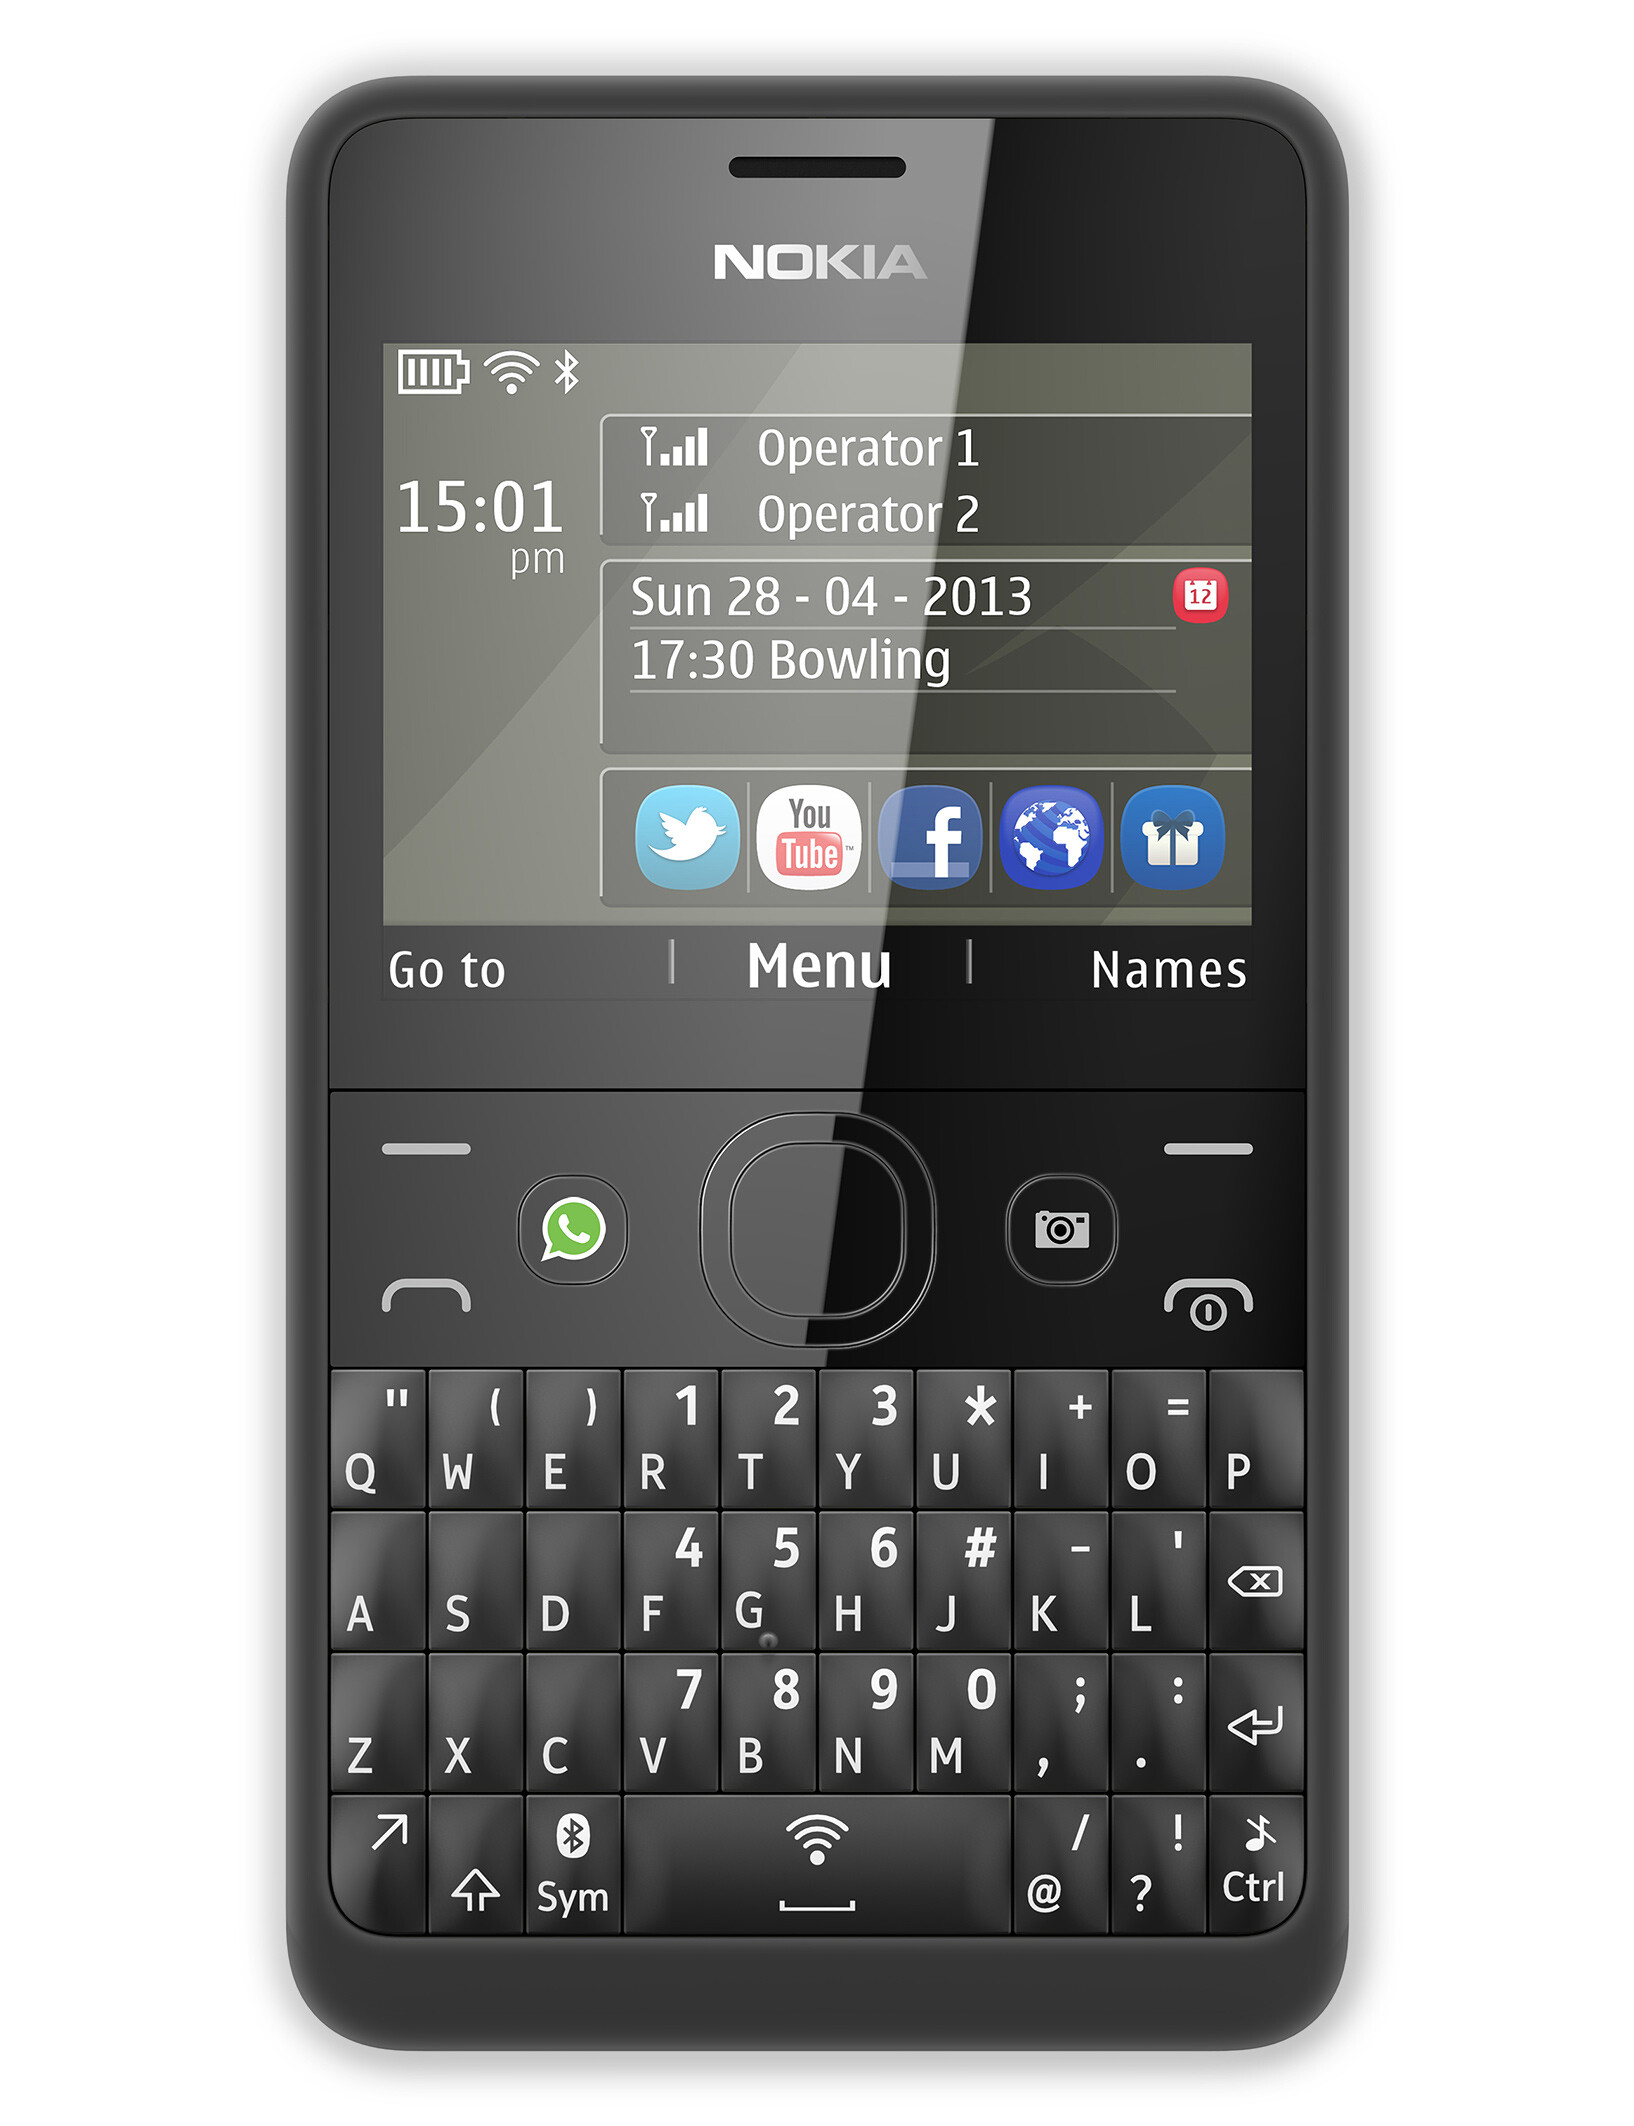 Download whatsapp for nokia asha 201 latest version